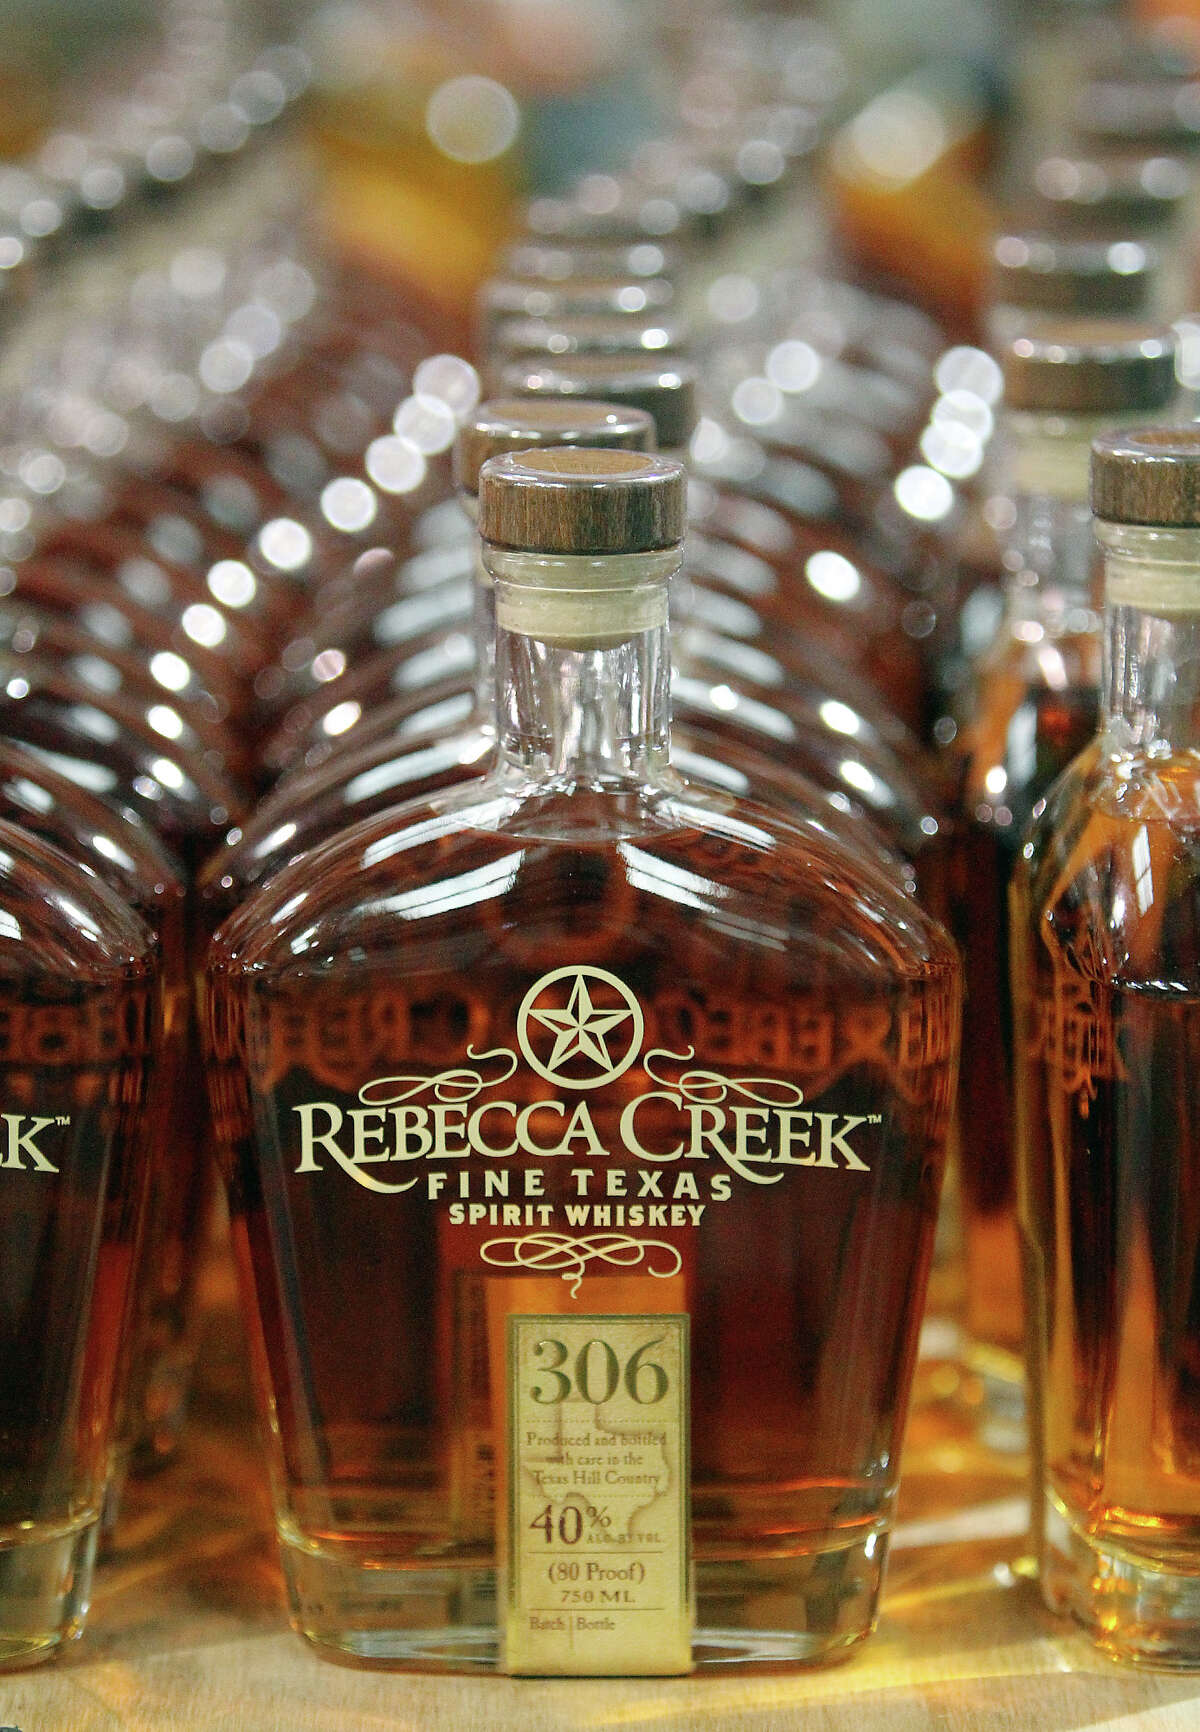 Sealed bottles of Rebecca Creek Distillery's Texas Whiskey